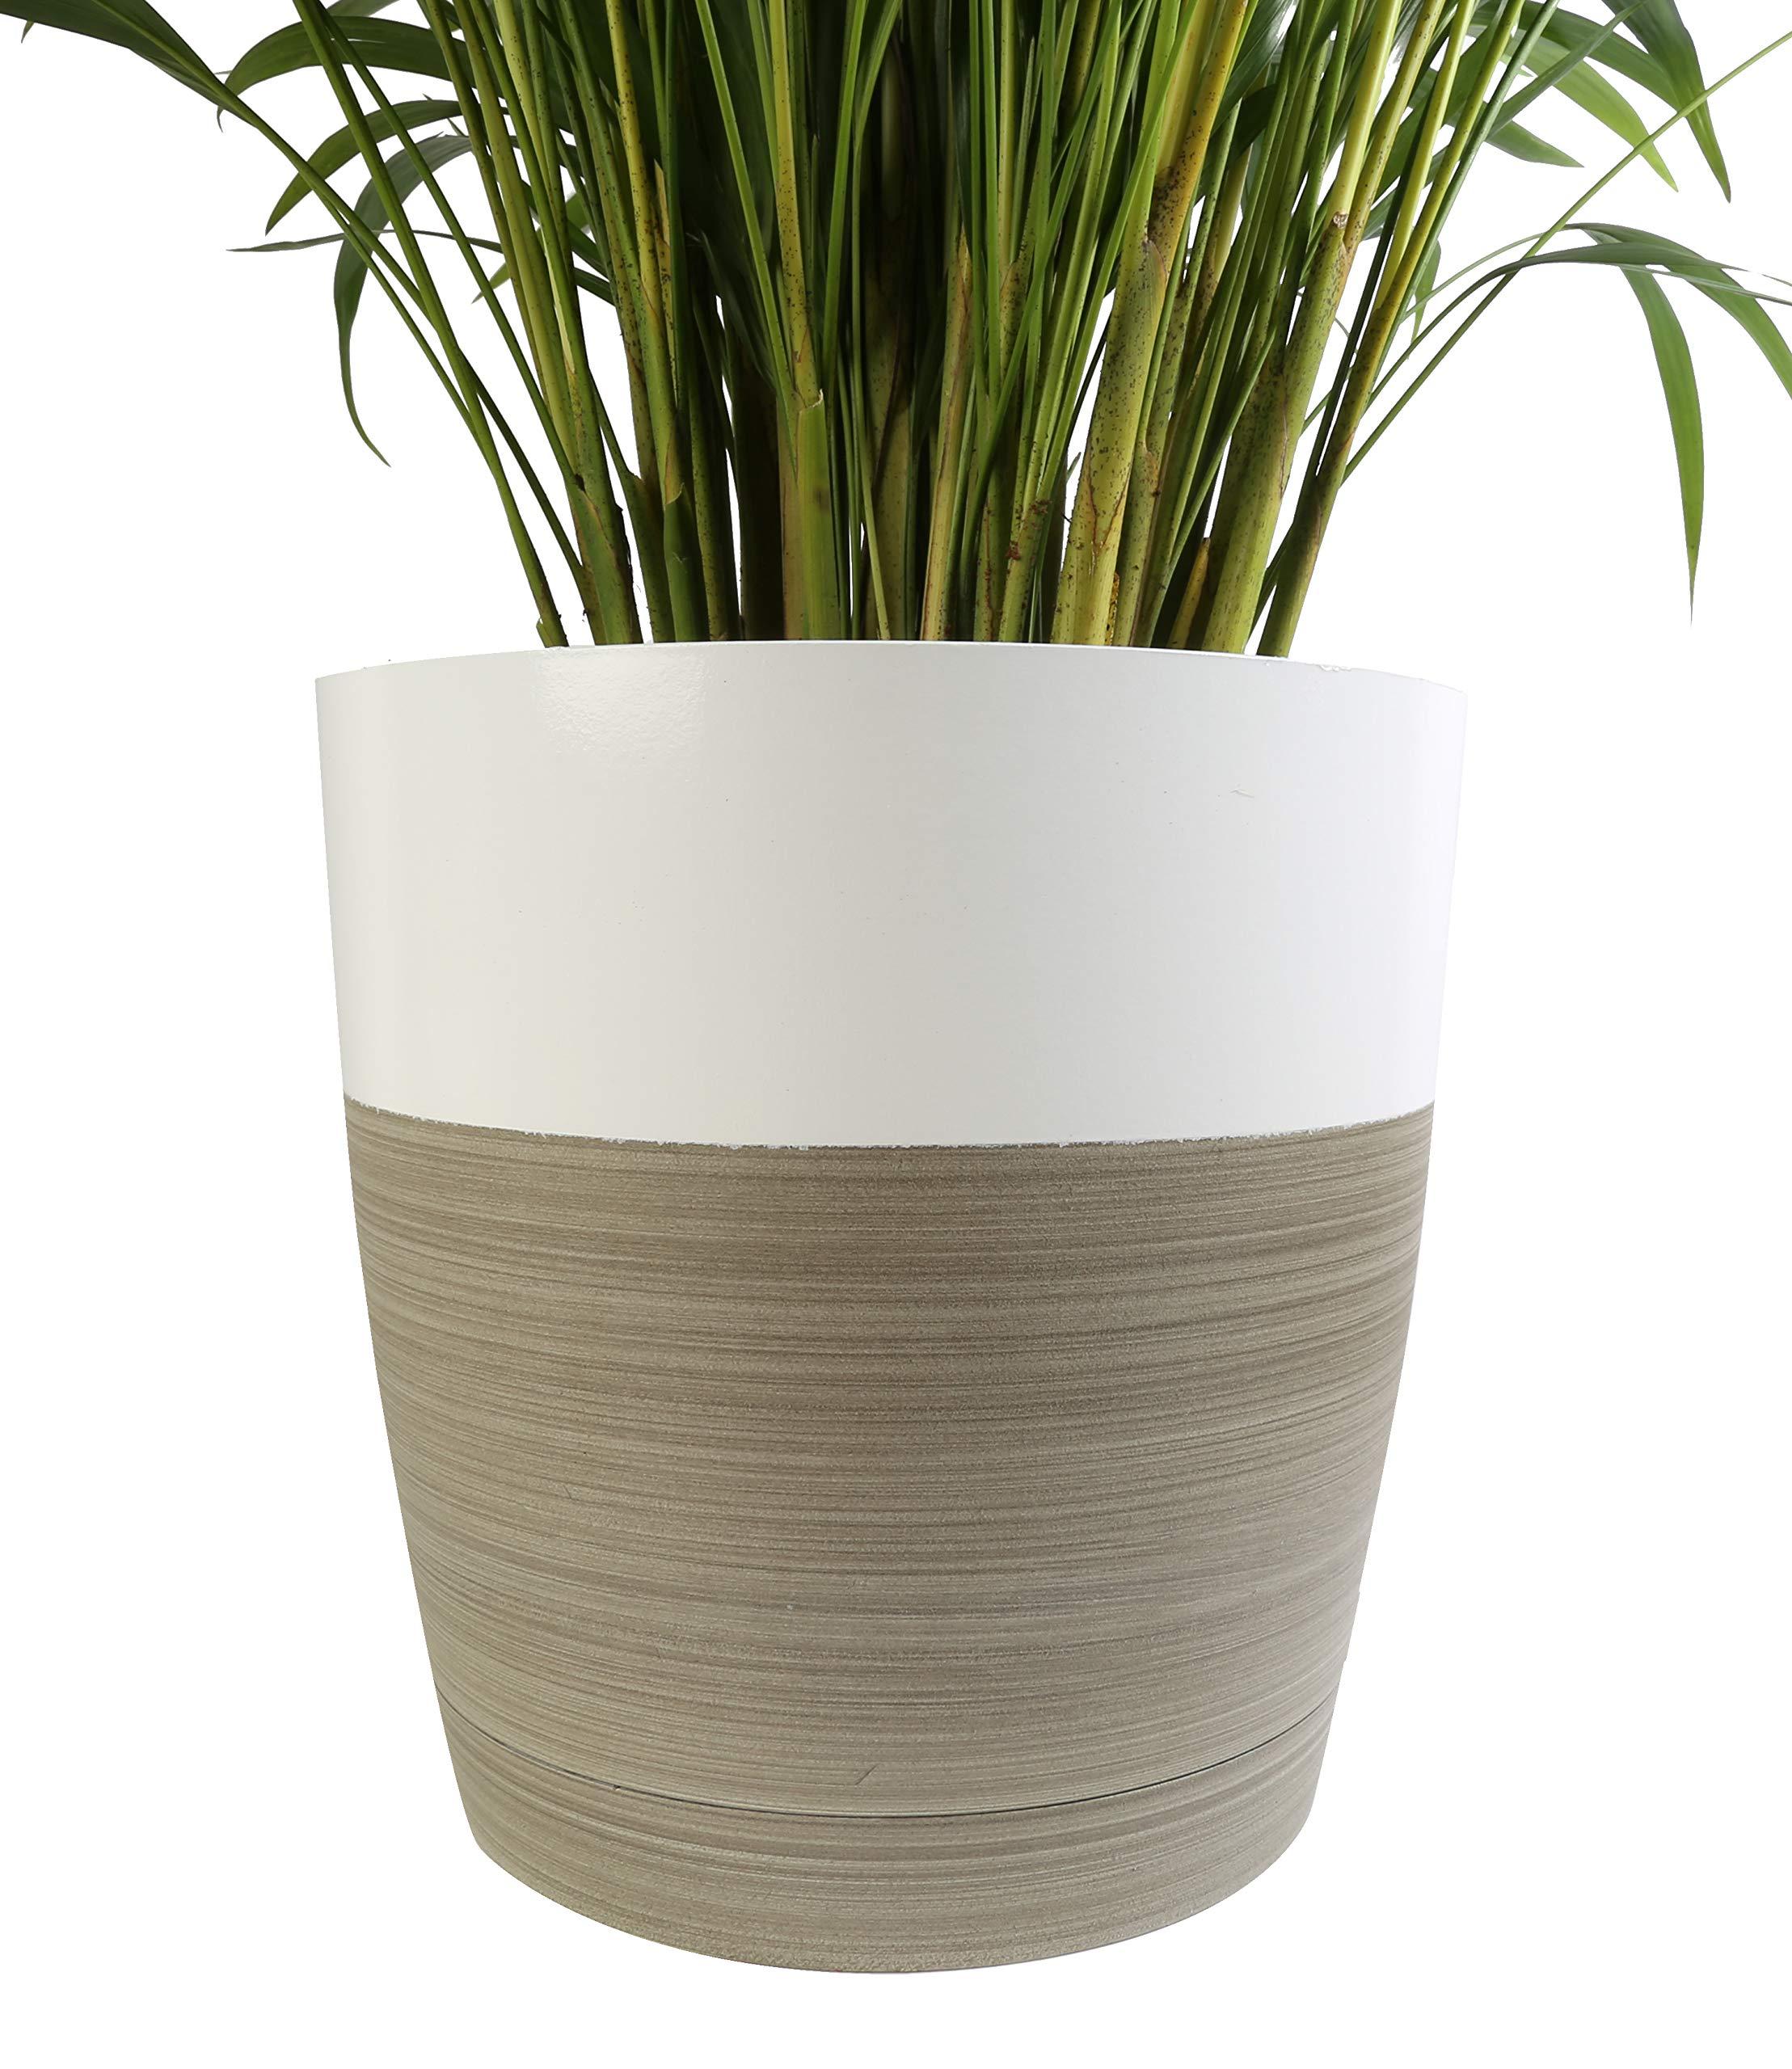 Costa Farms Live Areca Palm in Decor Planter, 3-Foot, White-Natural by Costa Farms (Image #2)